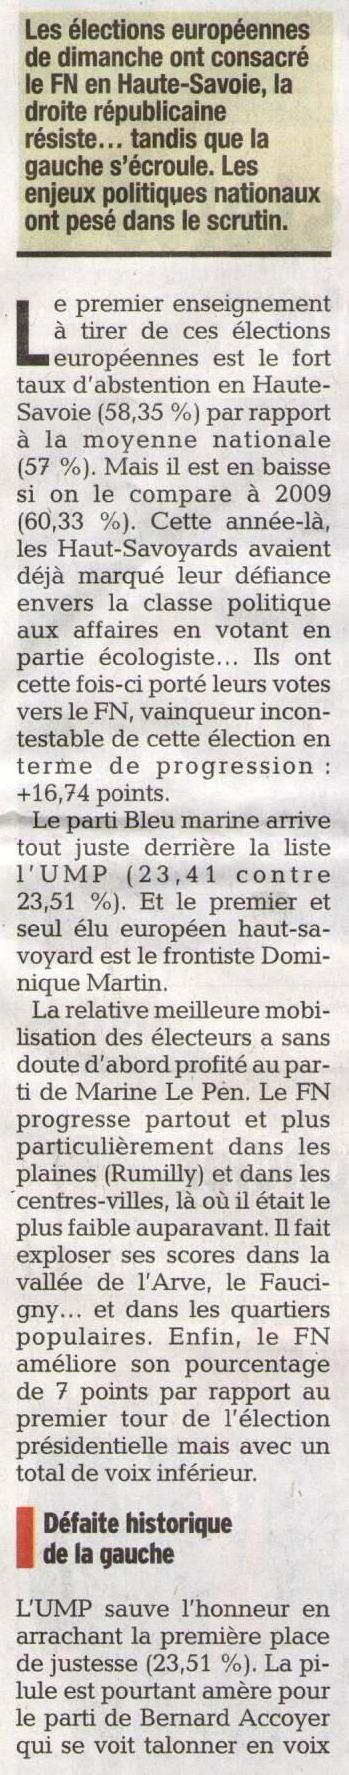 05 - 27mai14 - DL Tardy européennes Copé (3).jpeg